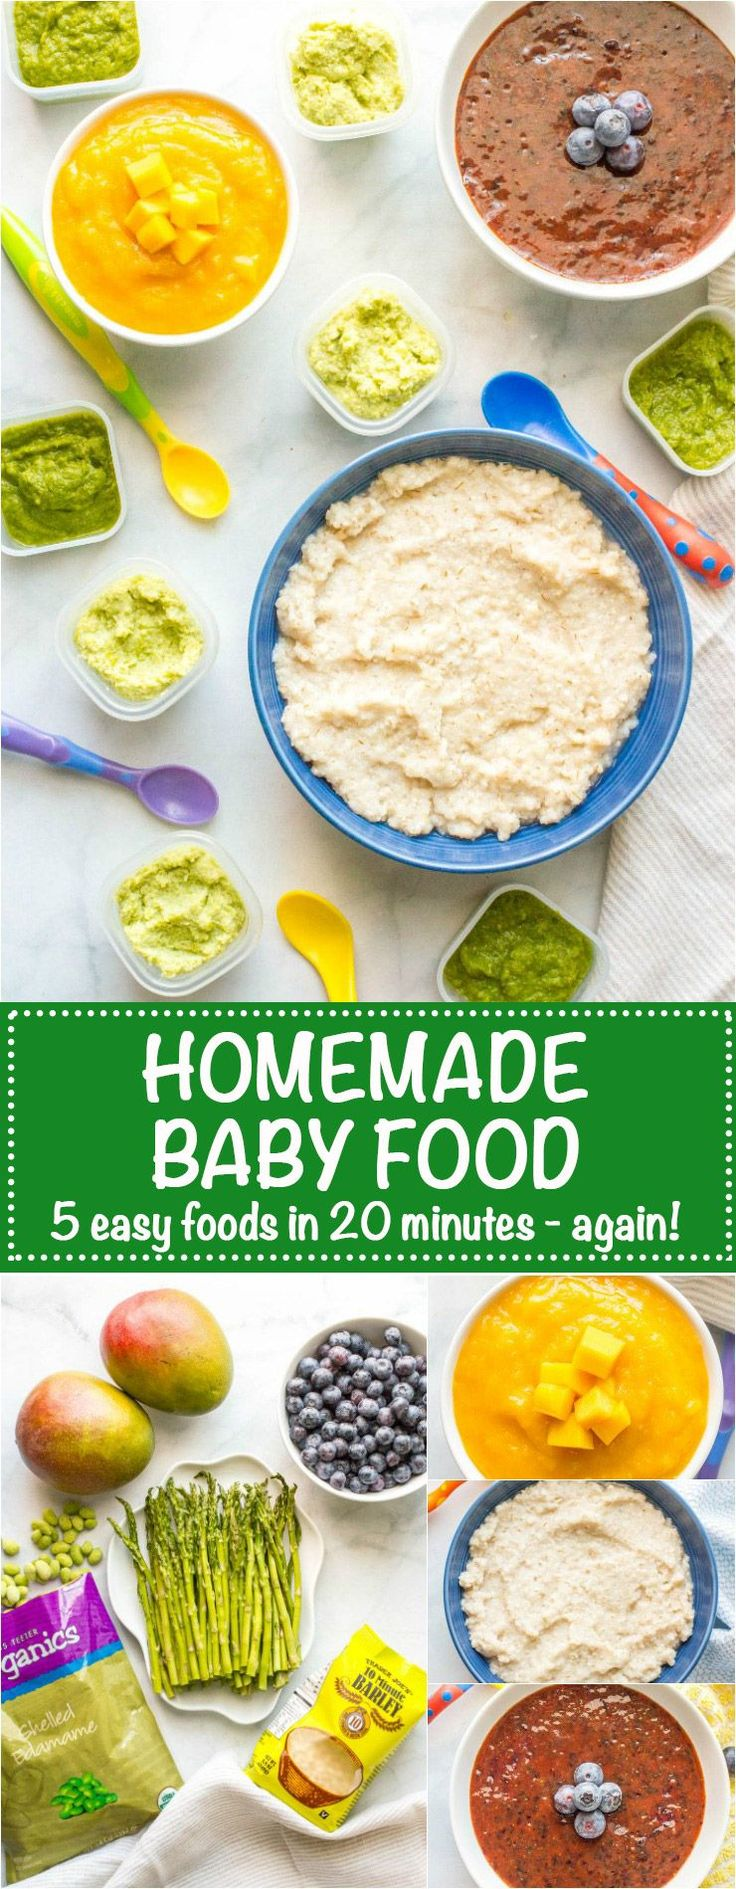 Homemade baby food barley asparagus edamame blueberries and mango